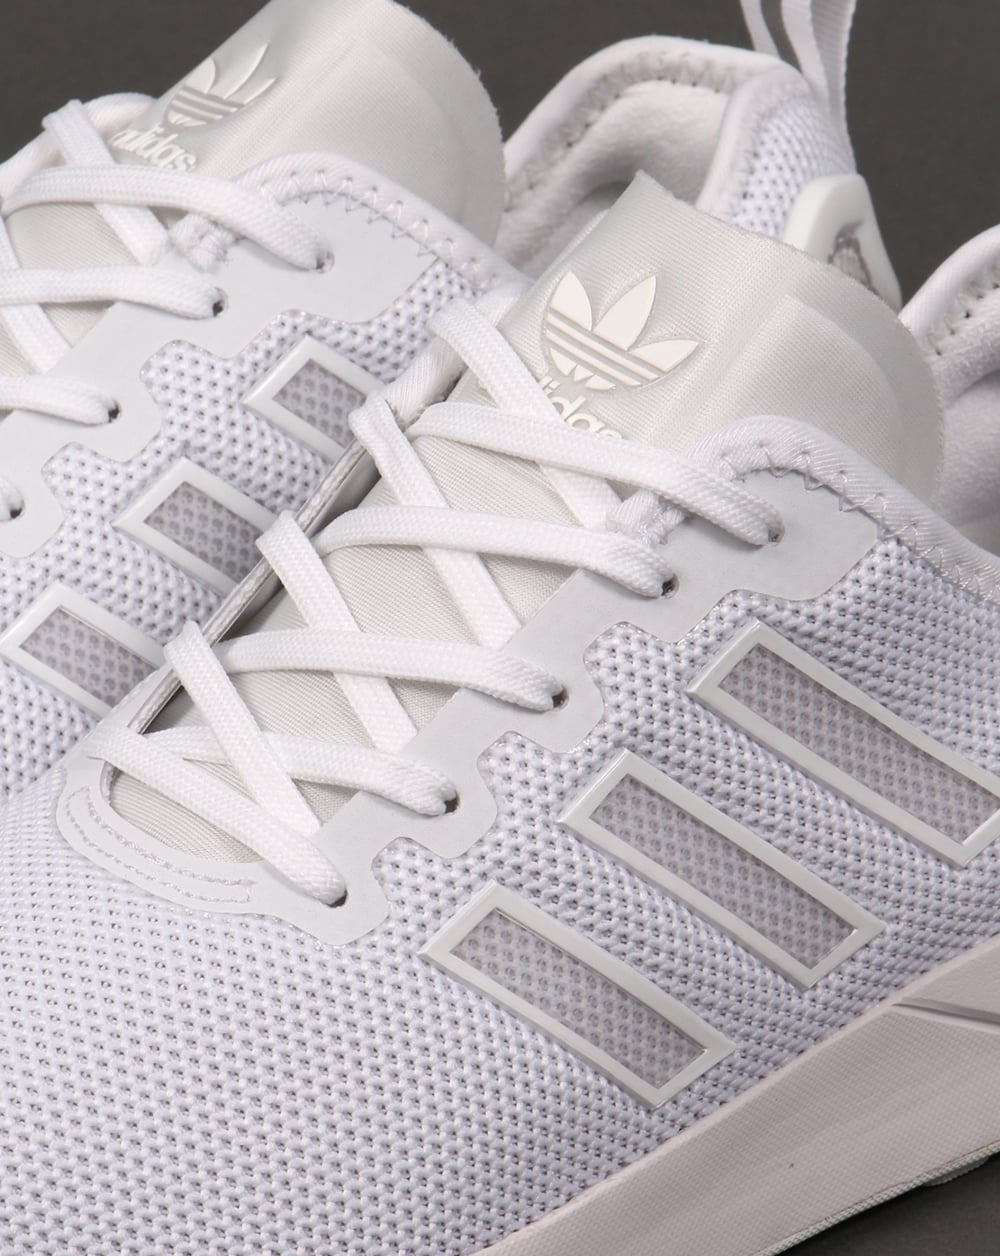 Adidas Originals Menns Zx Flux Trenere Hvit kPrOSwj